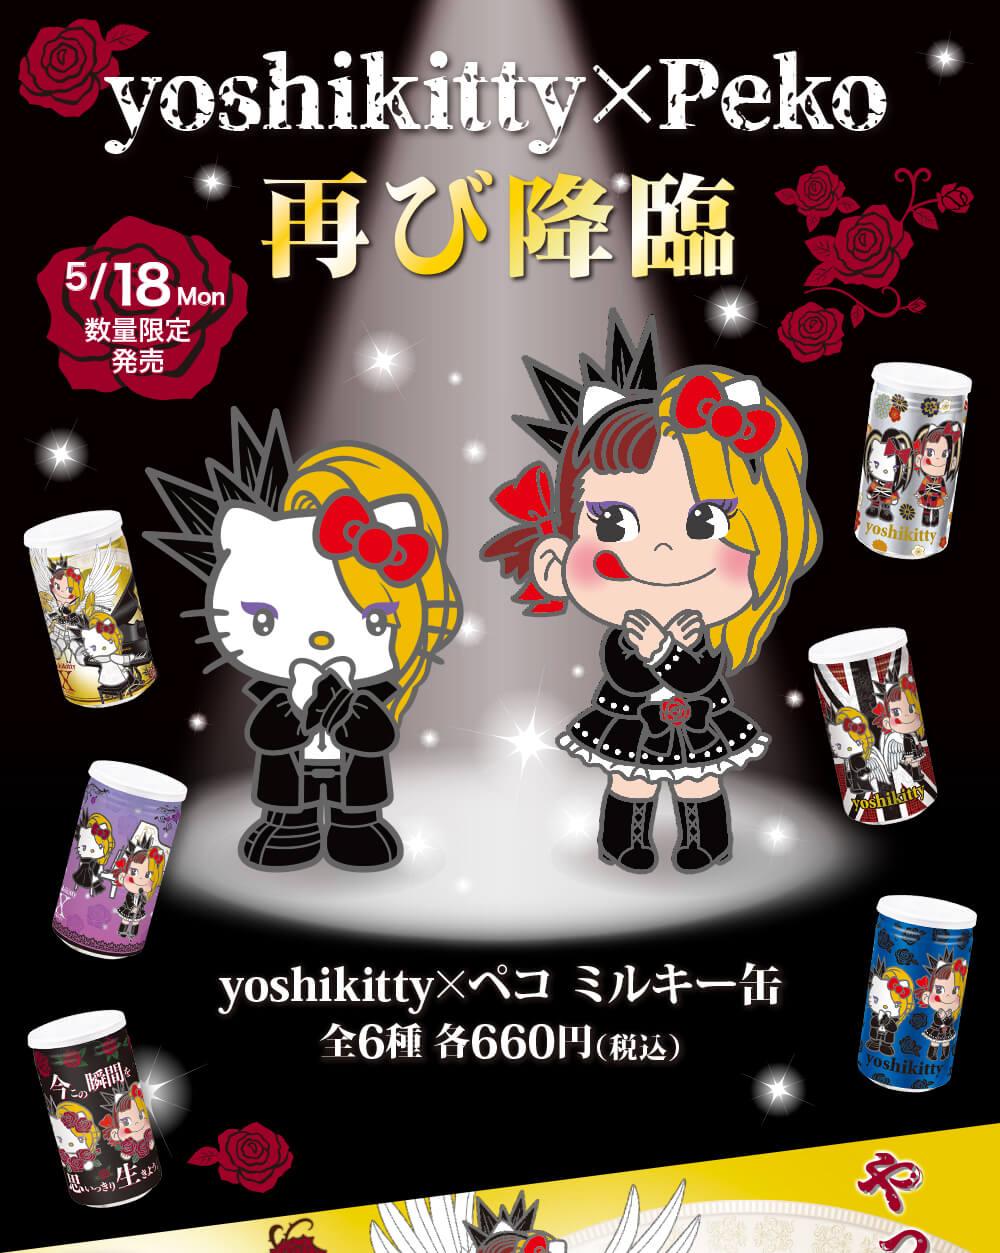 「yoshikitty」×「ペコちゃん」コラボ再び降臨!不二家から数量限定でミルキー缶が登場